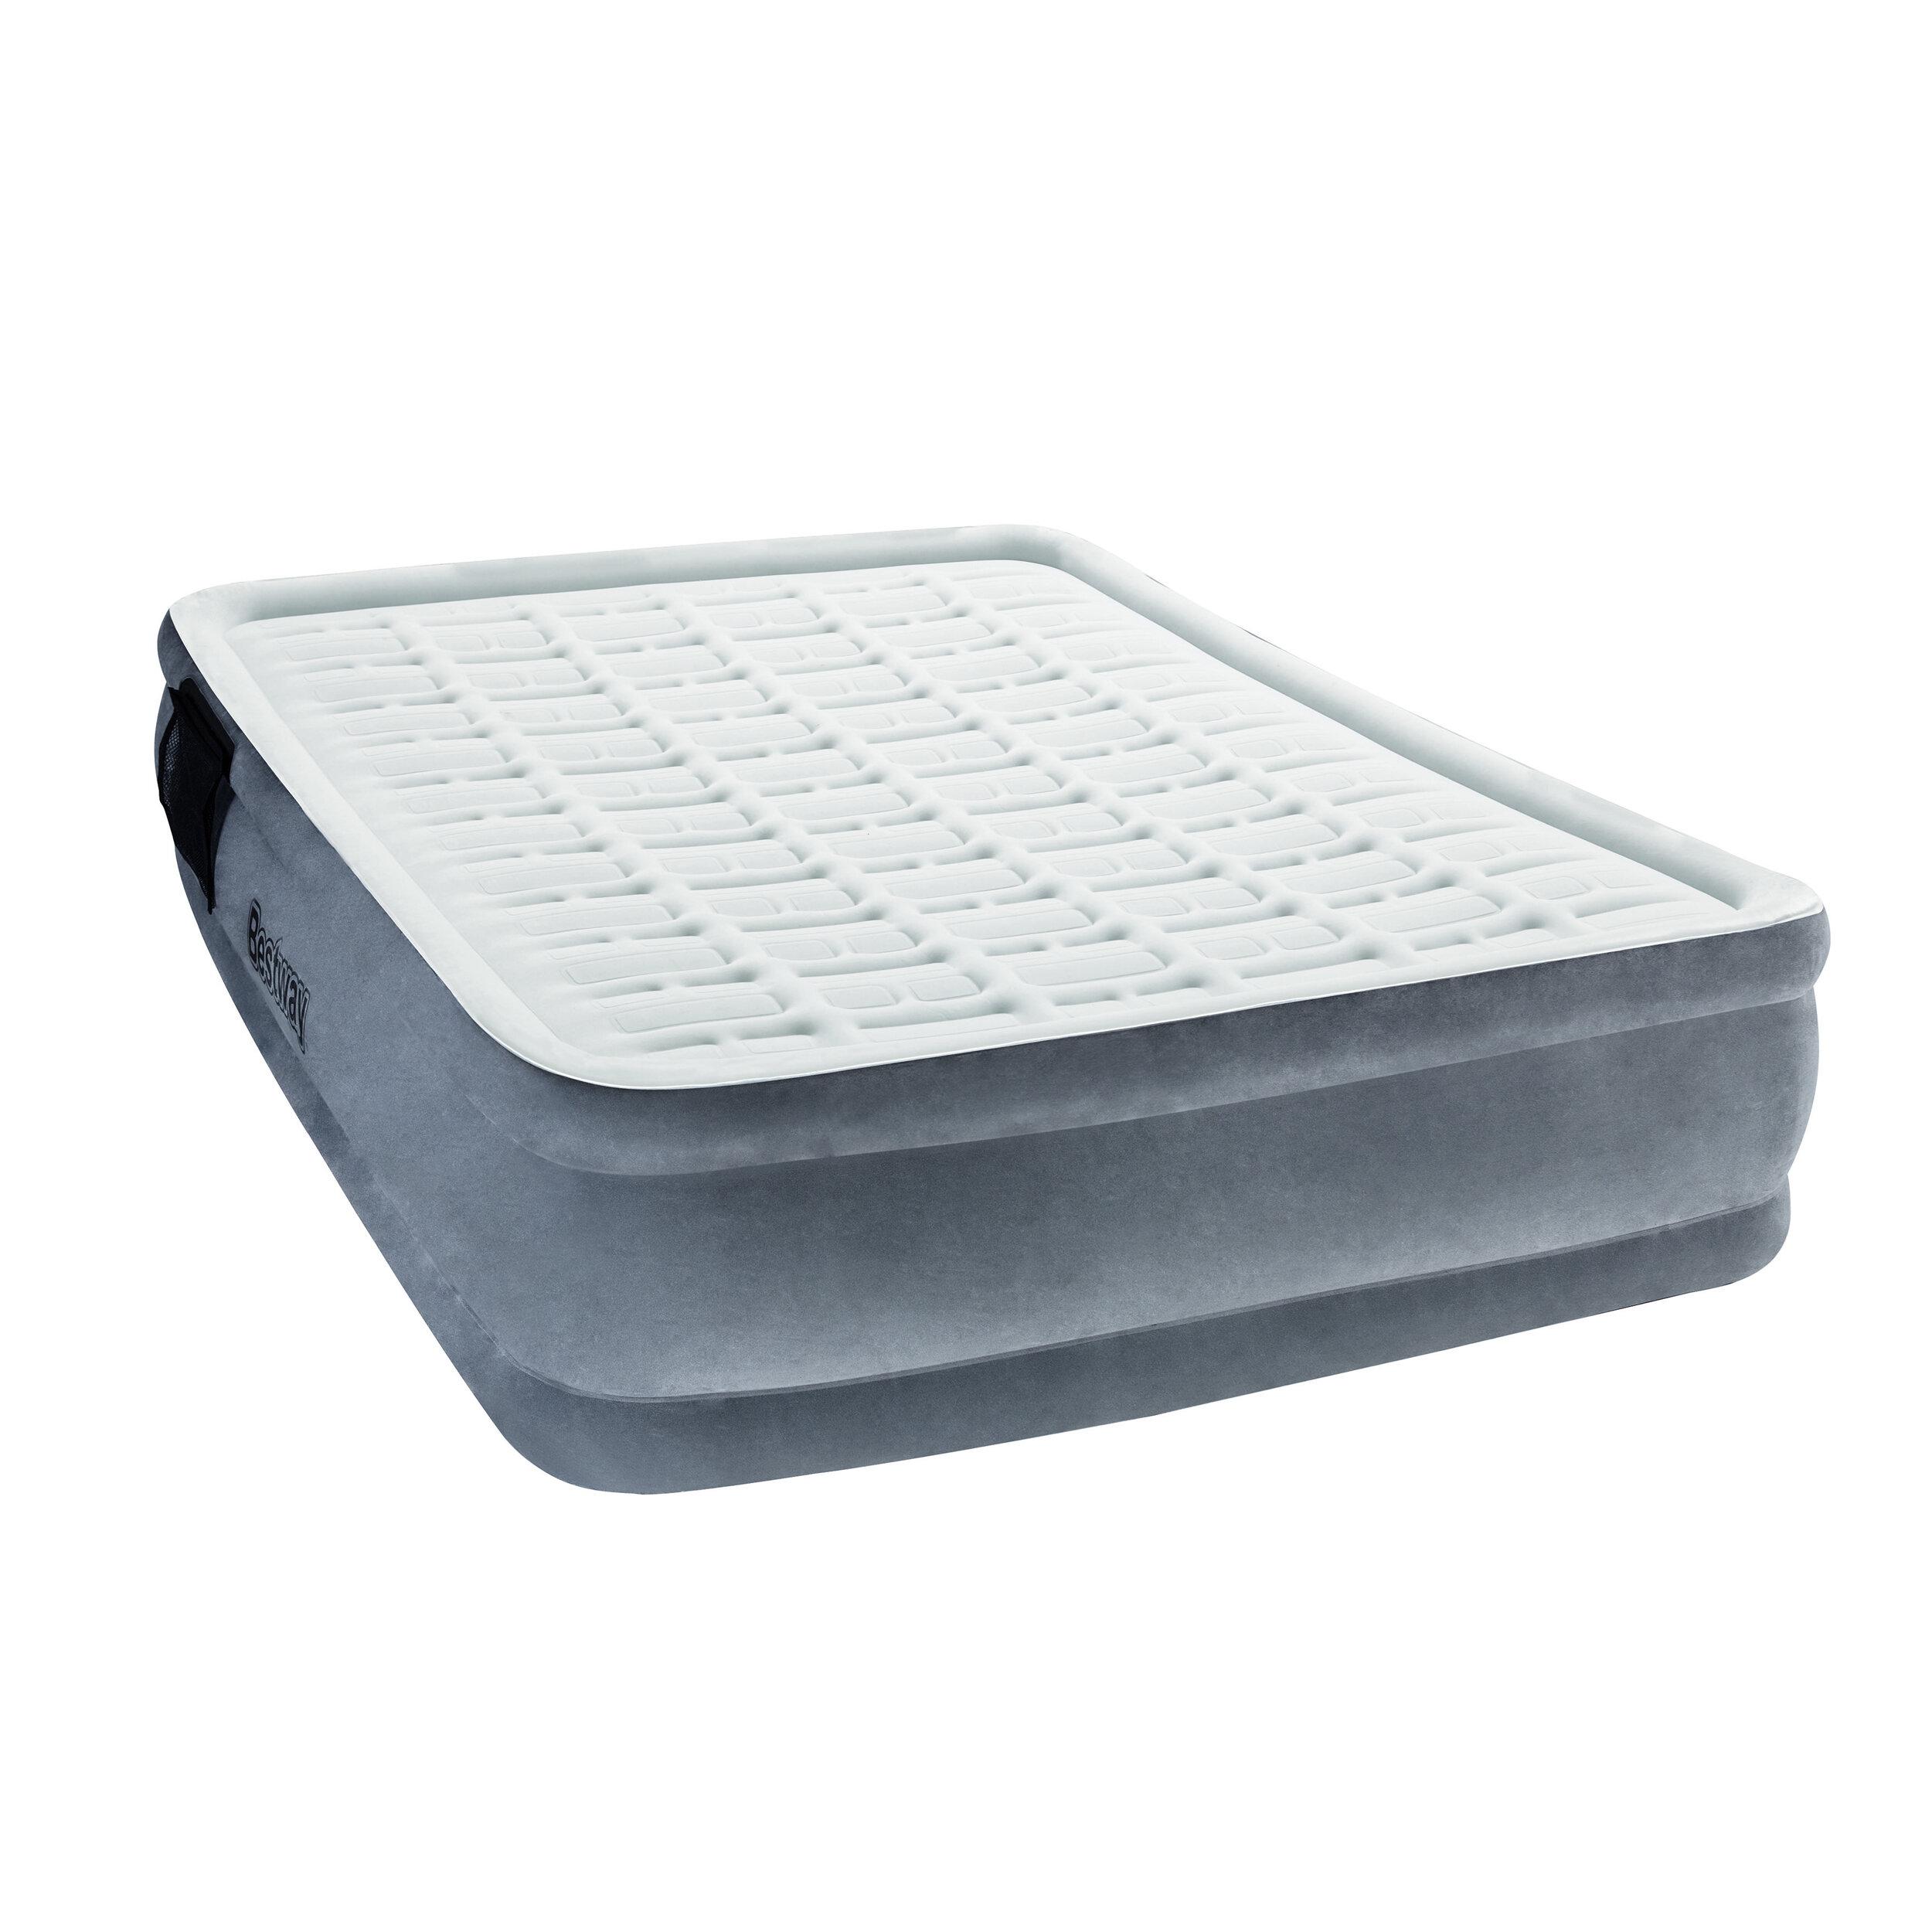 inflatable camping quechua comfort id person mattress air